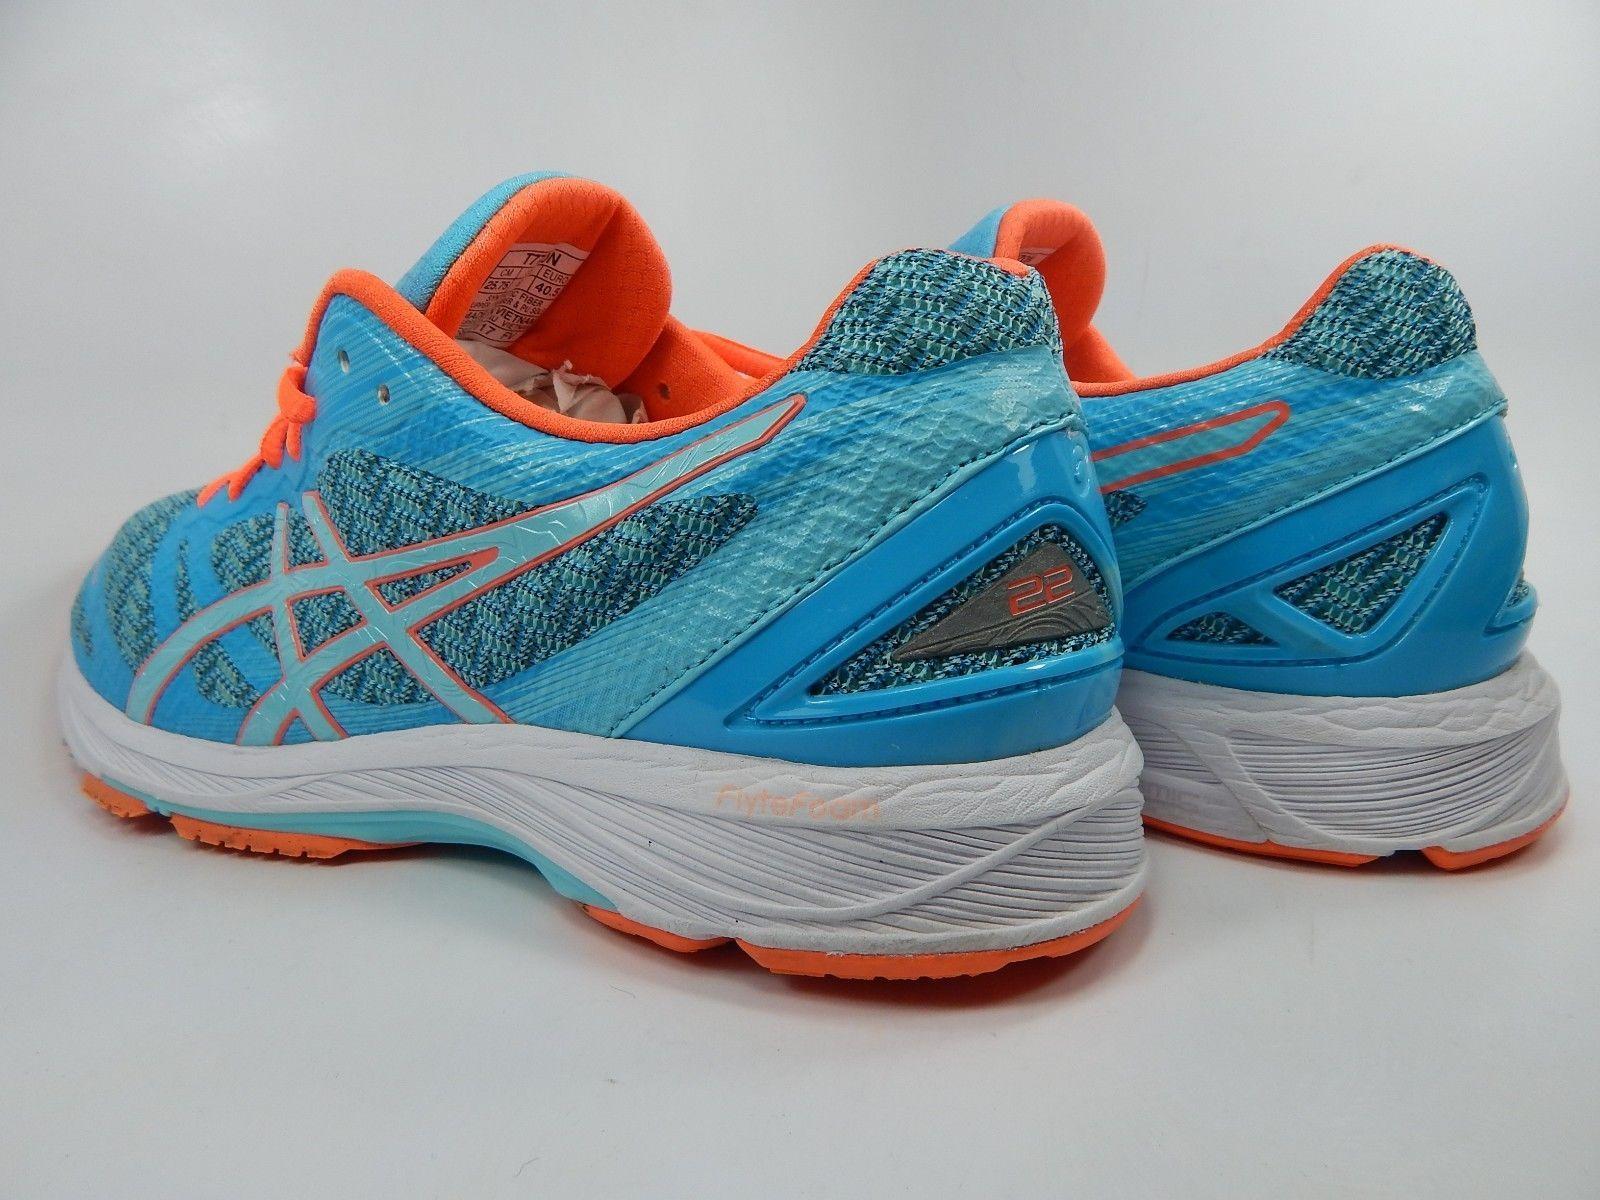 meet 7ae4e 2aea3 Asics Gel DS Trainer 22 Women s Running Shoes Size US 9 M (B) EU